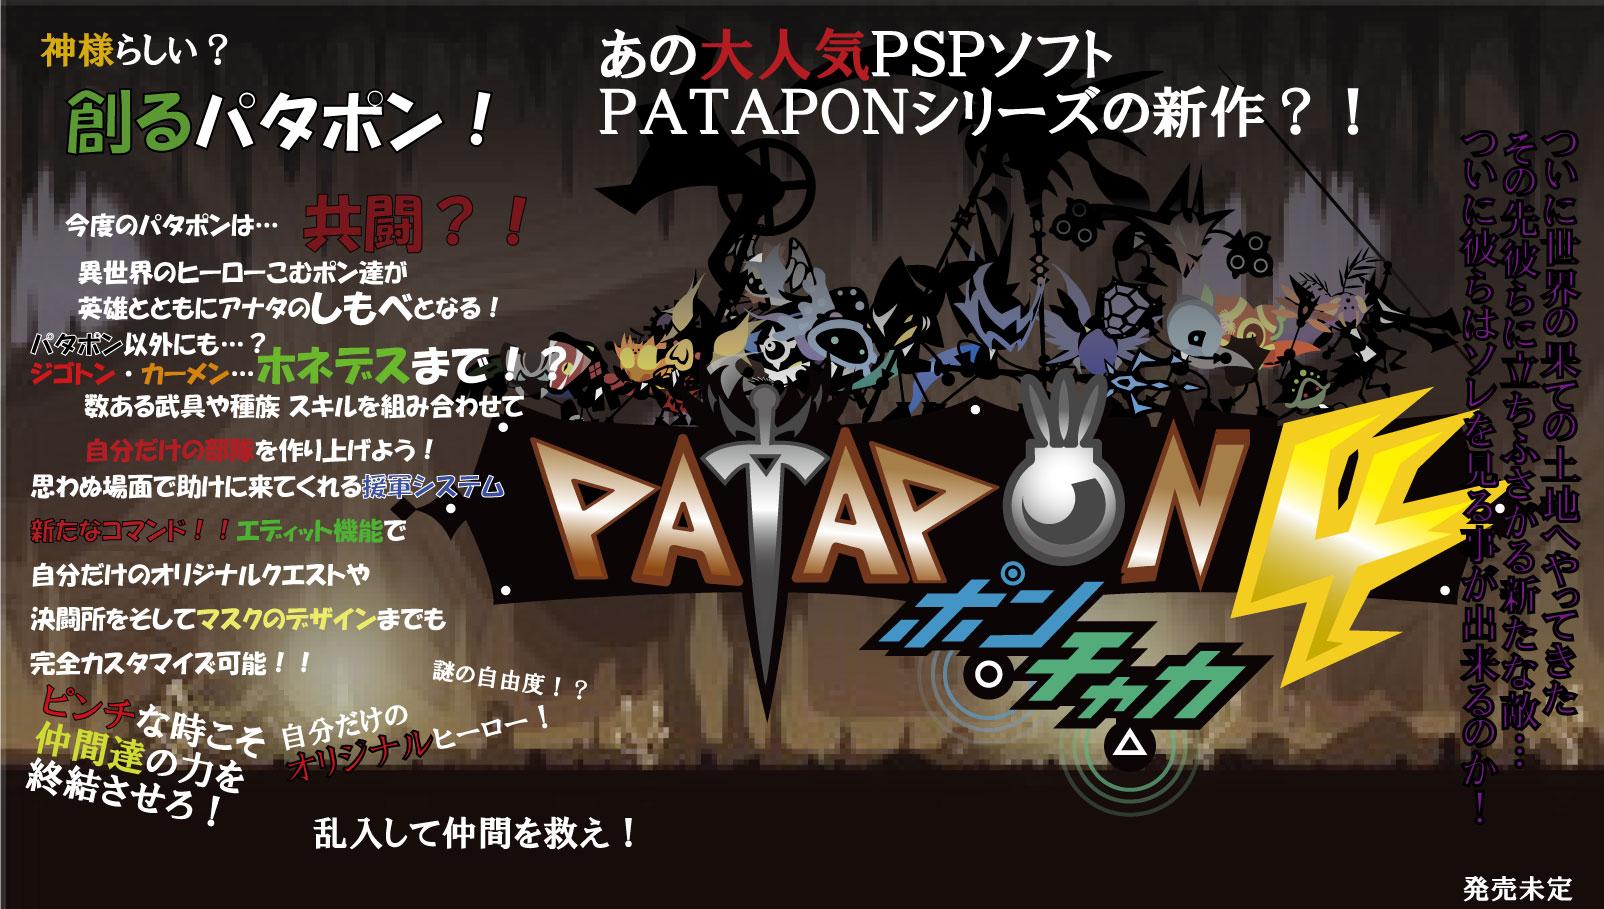 PATAPON4 新作発表